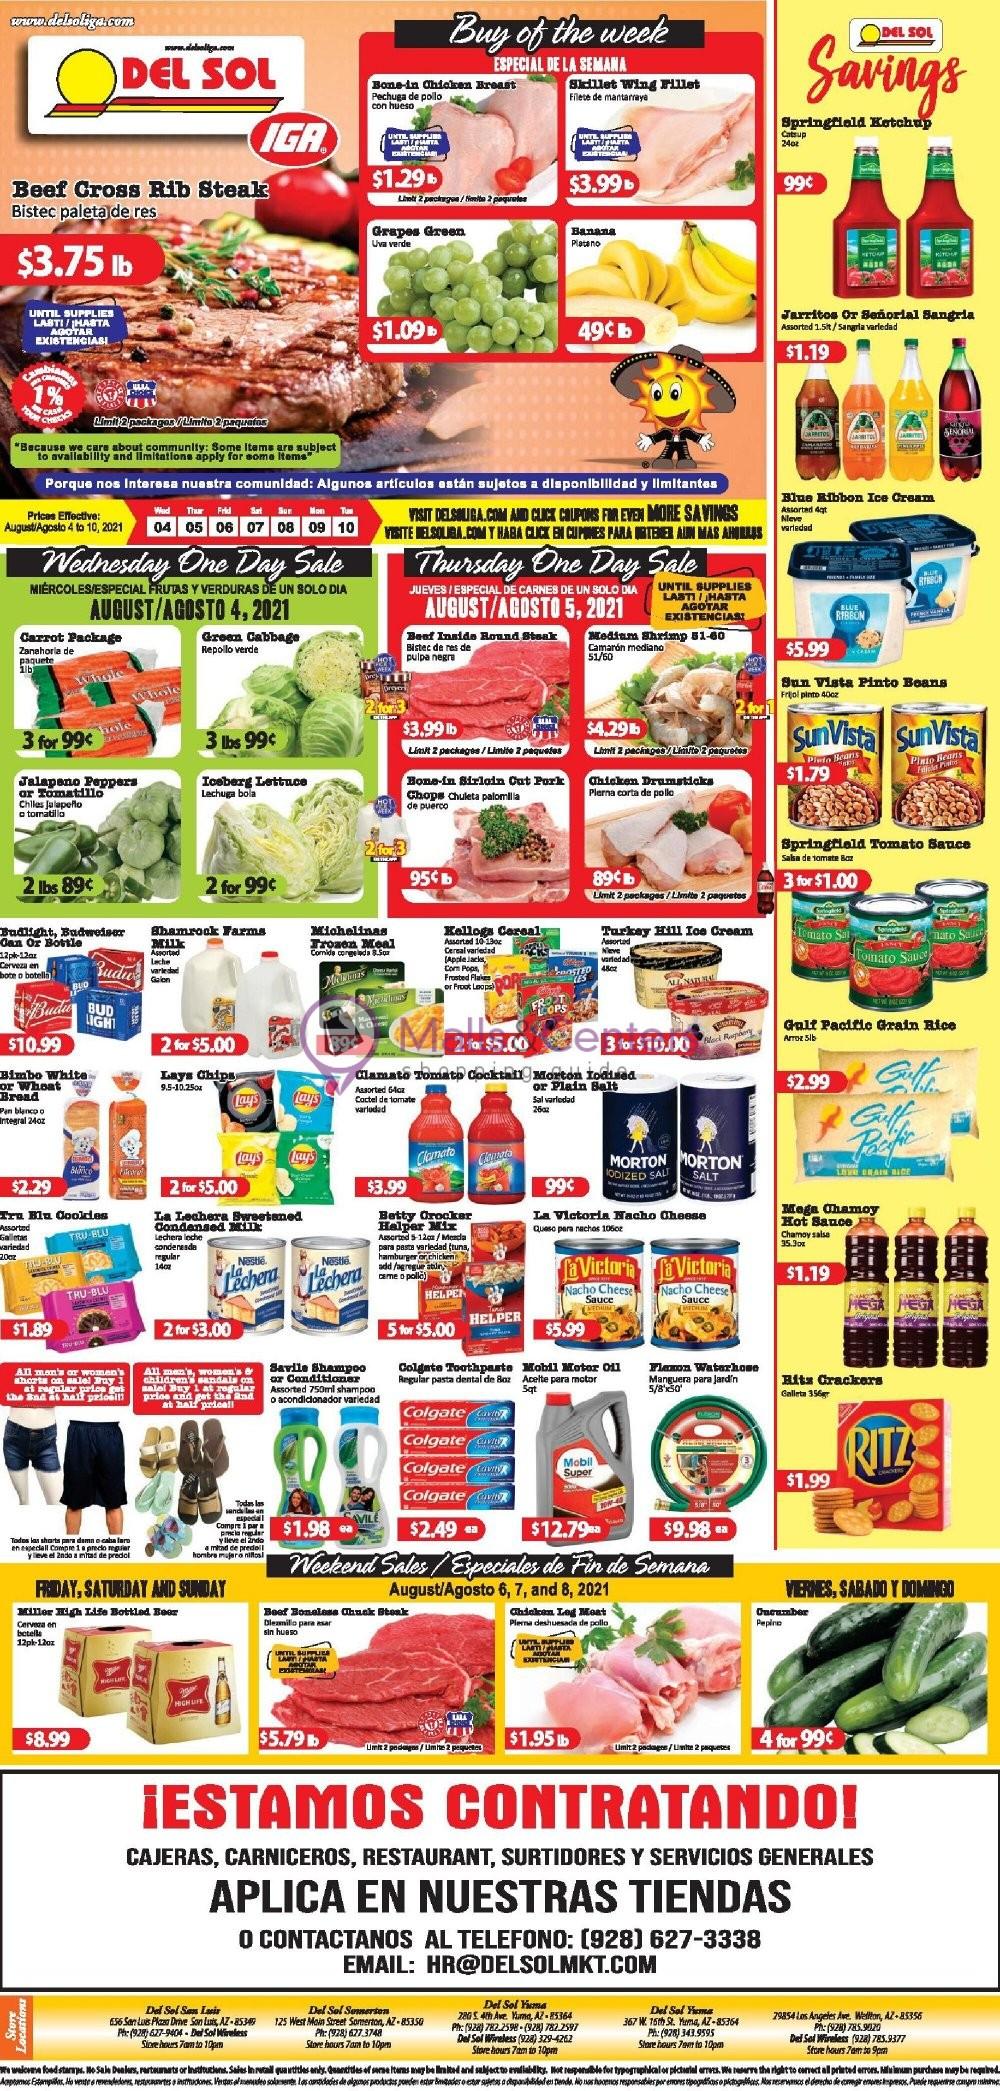 weekly ads Del Sol IGA - page 1 - mallscenters.com